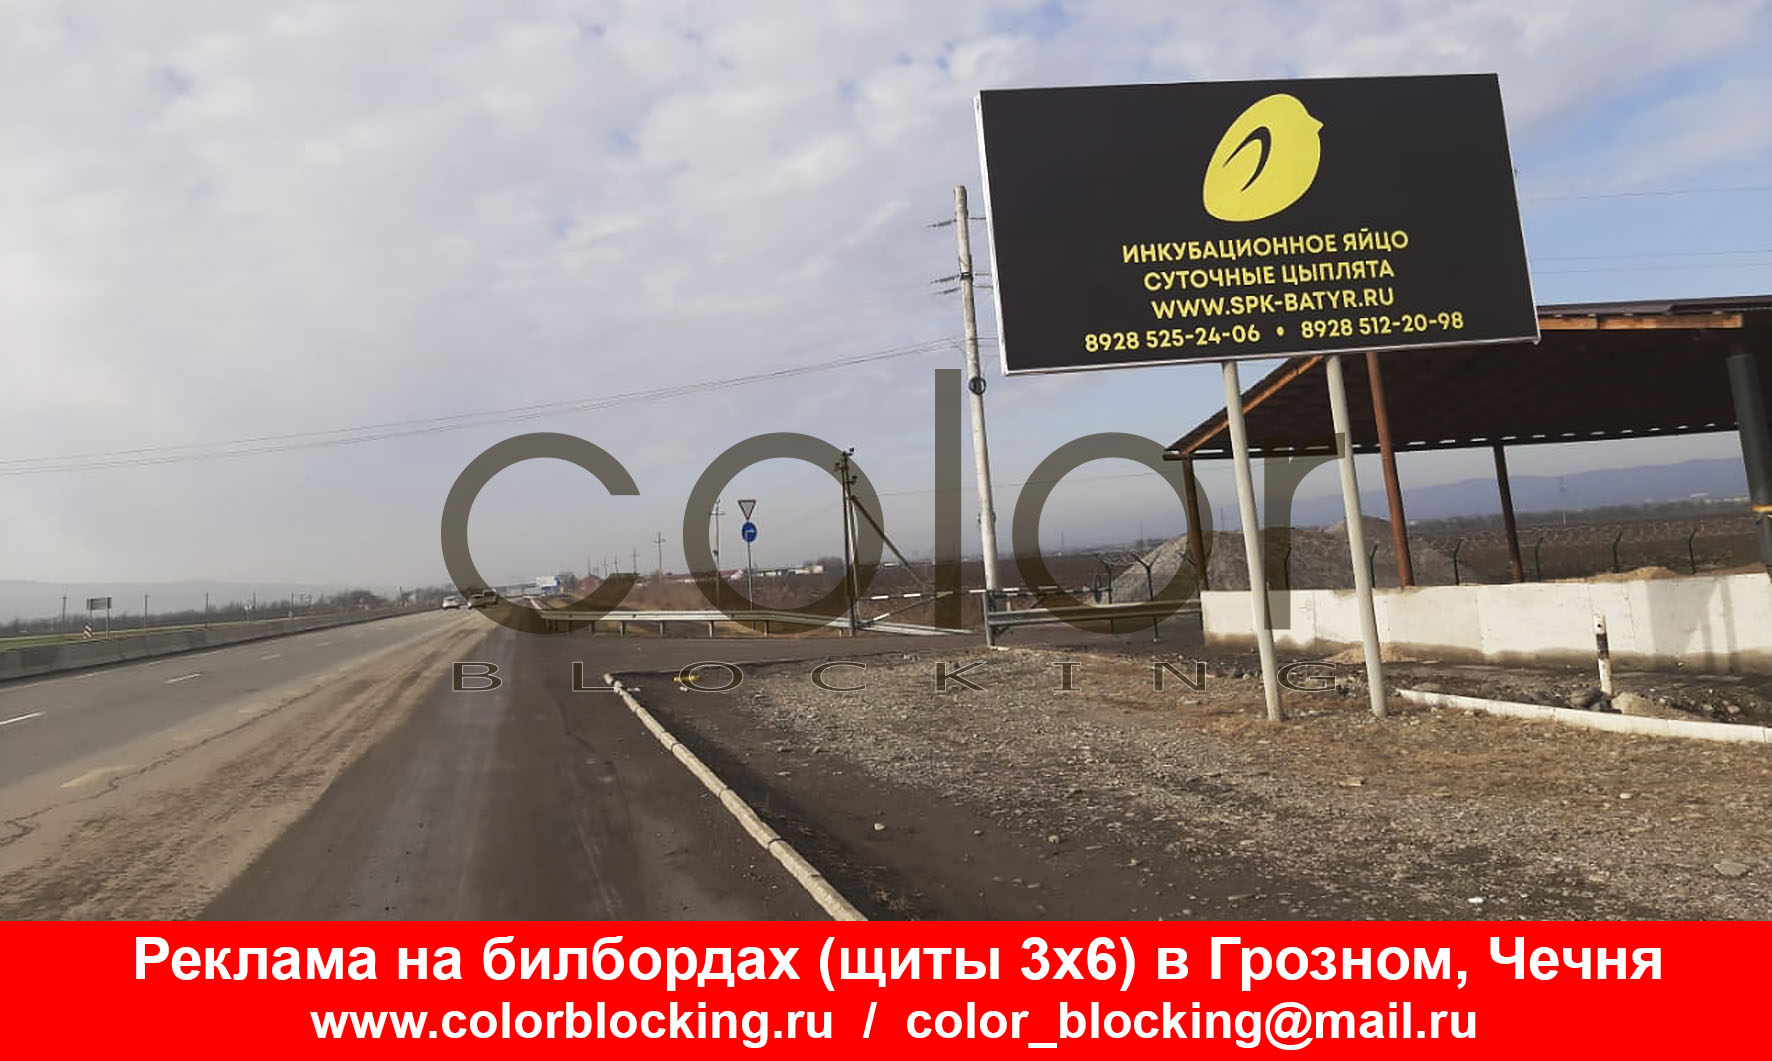 Реклама на билбордах трасса М29 Ингушетия